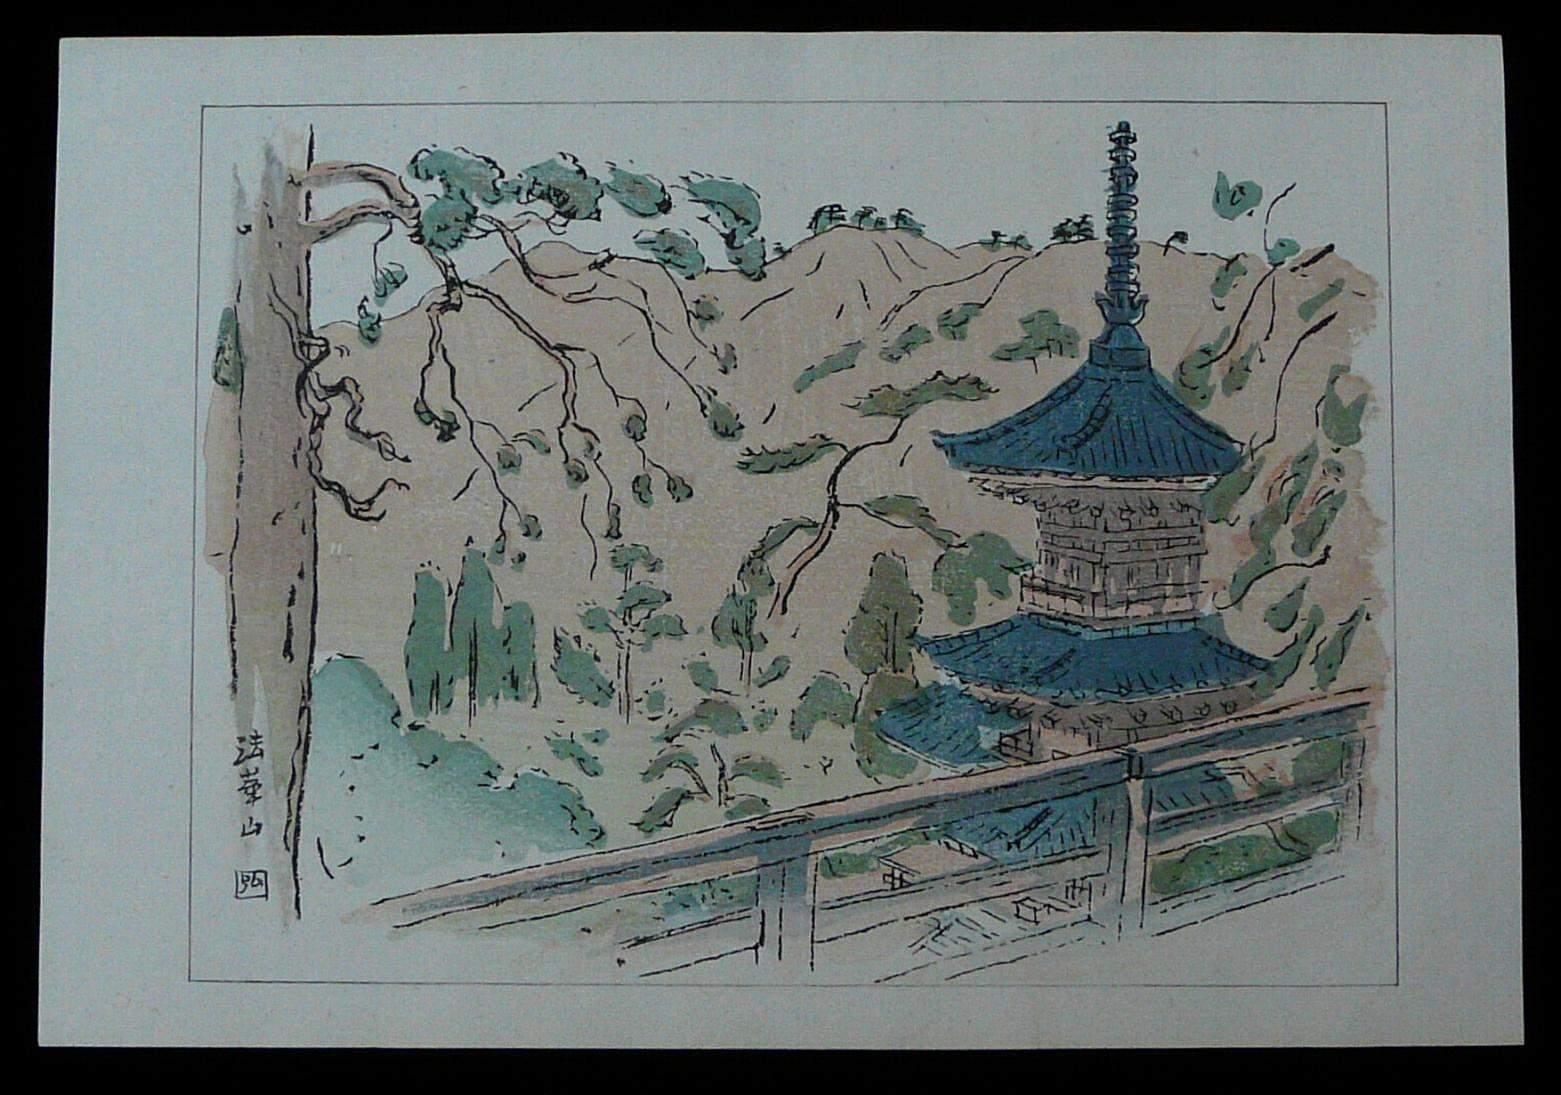 HIROMITSU NAKAZAWA: #P2937 ORIGINAL FIRST EDITION JAPANESE WOODBLOCK PRINT